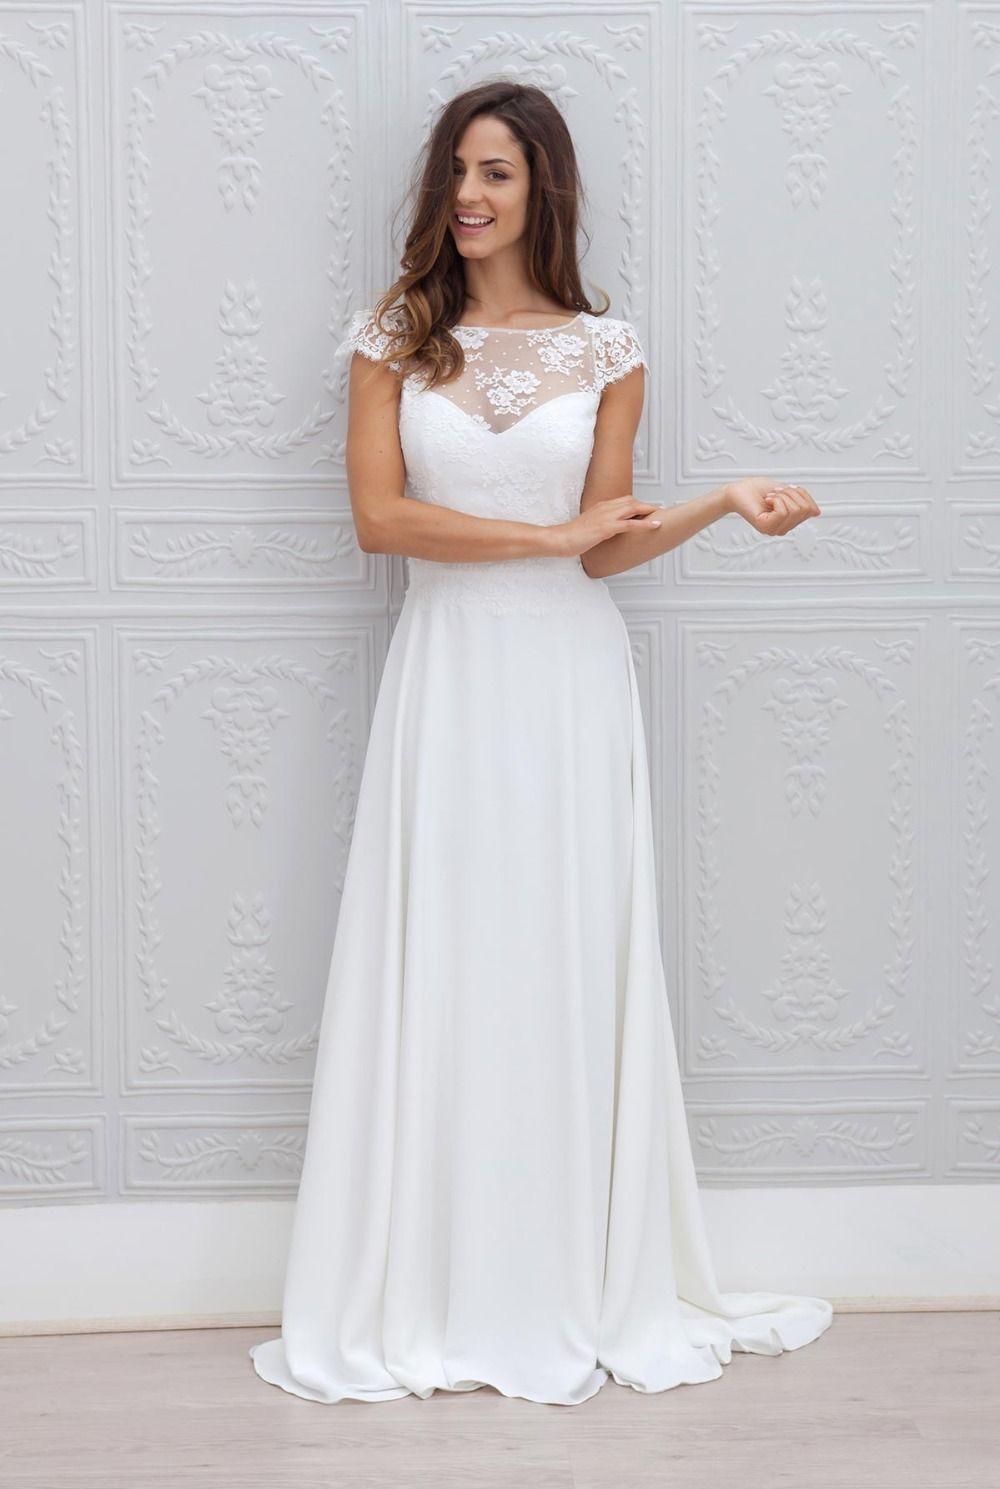 Free wedding dress  Pin by Abby Austin on wedding  Pinterest  Free Wedding and